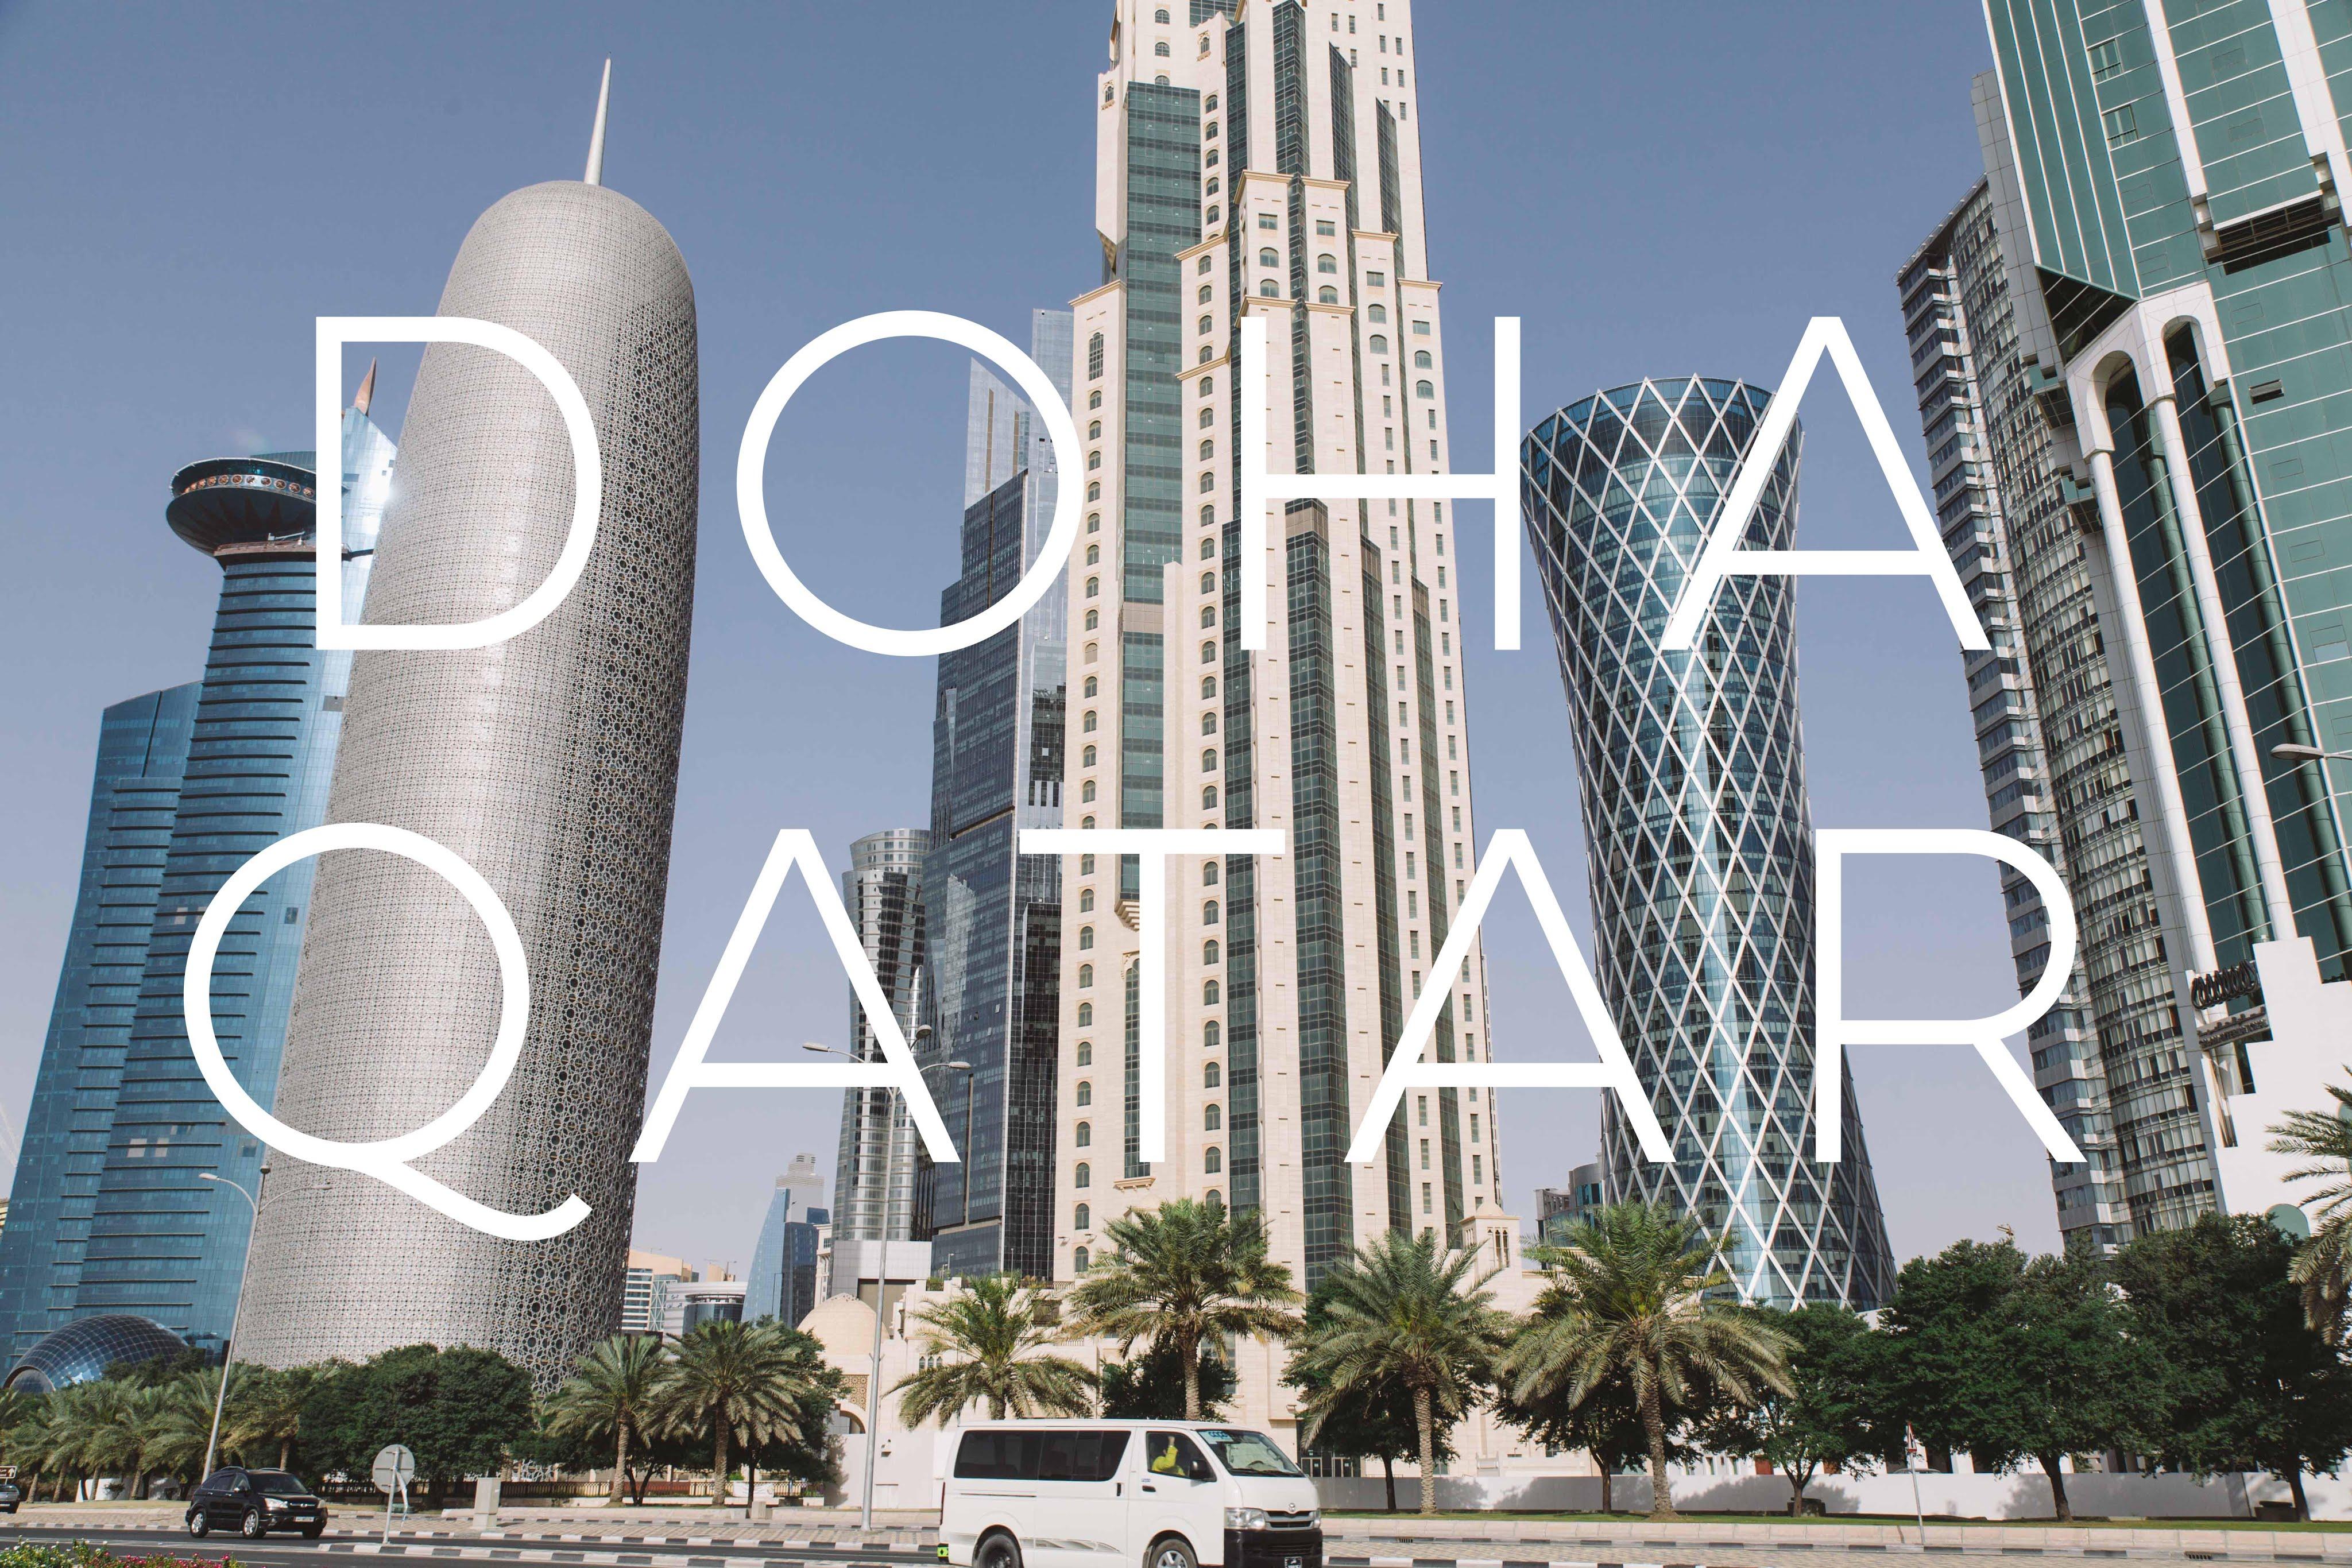 Lowongan Spa Therapist Wanita Doha - Qatar